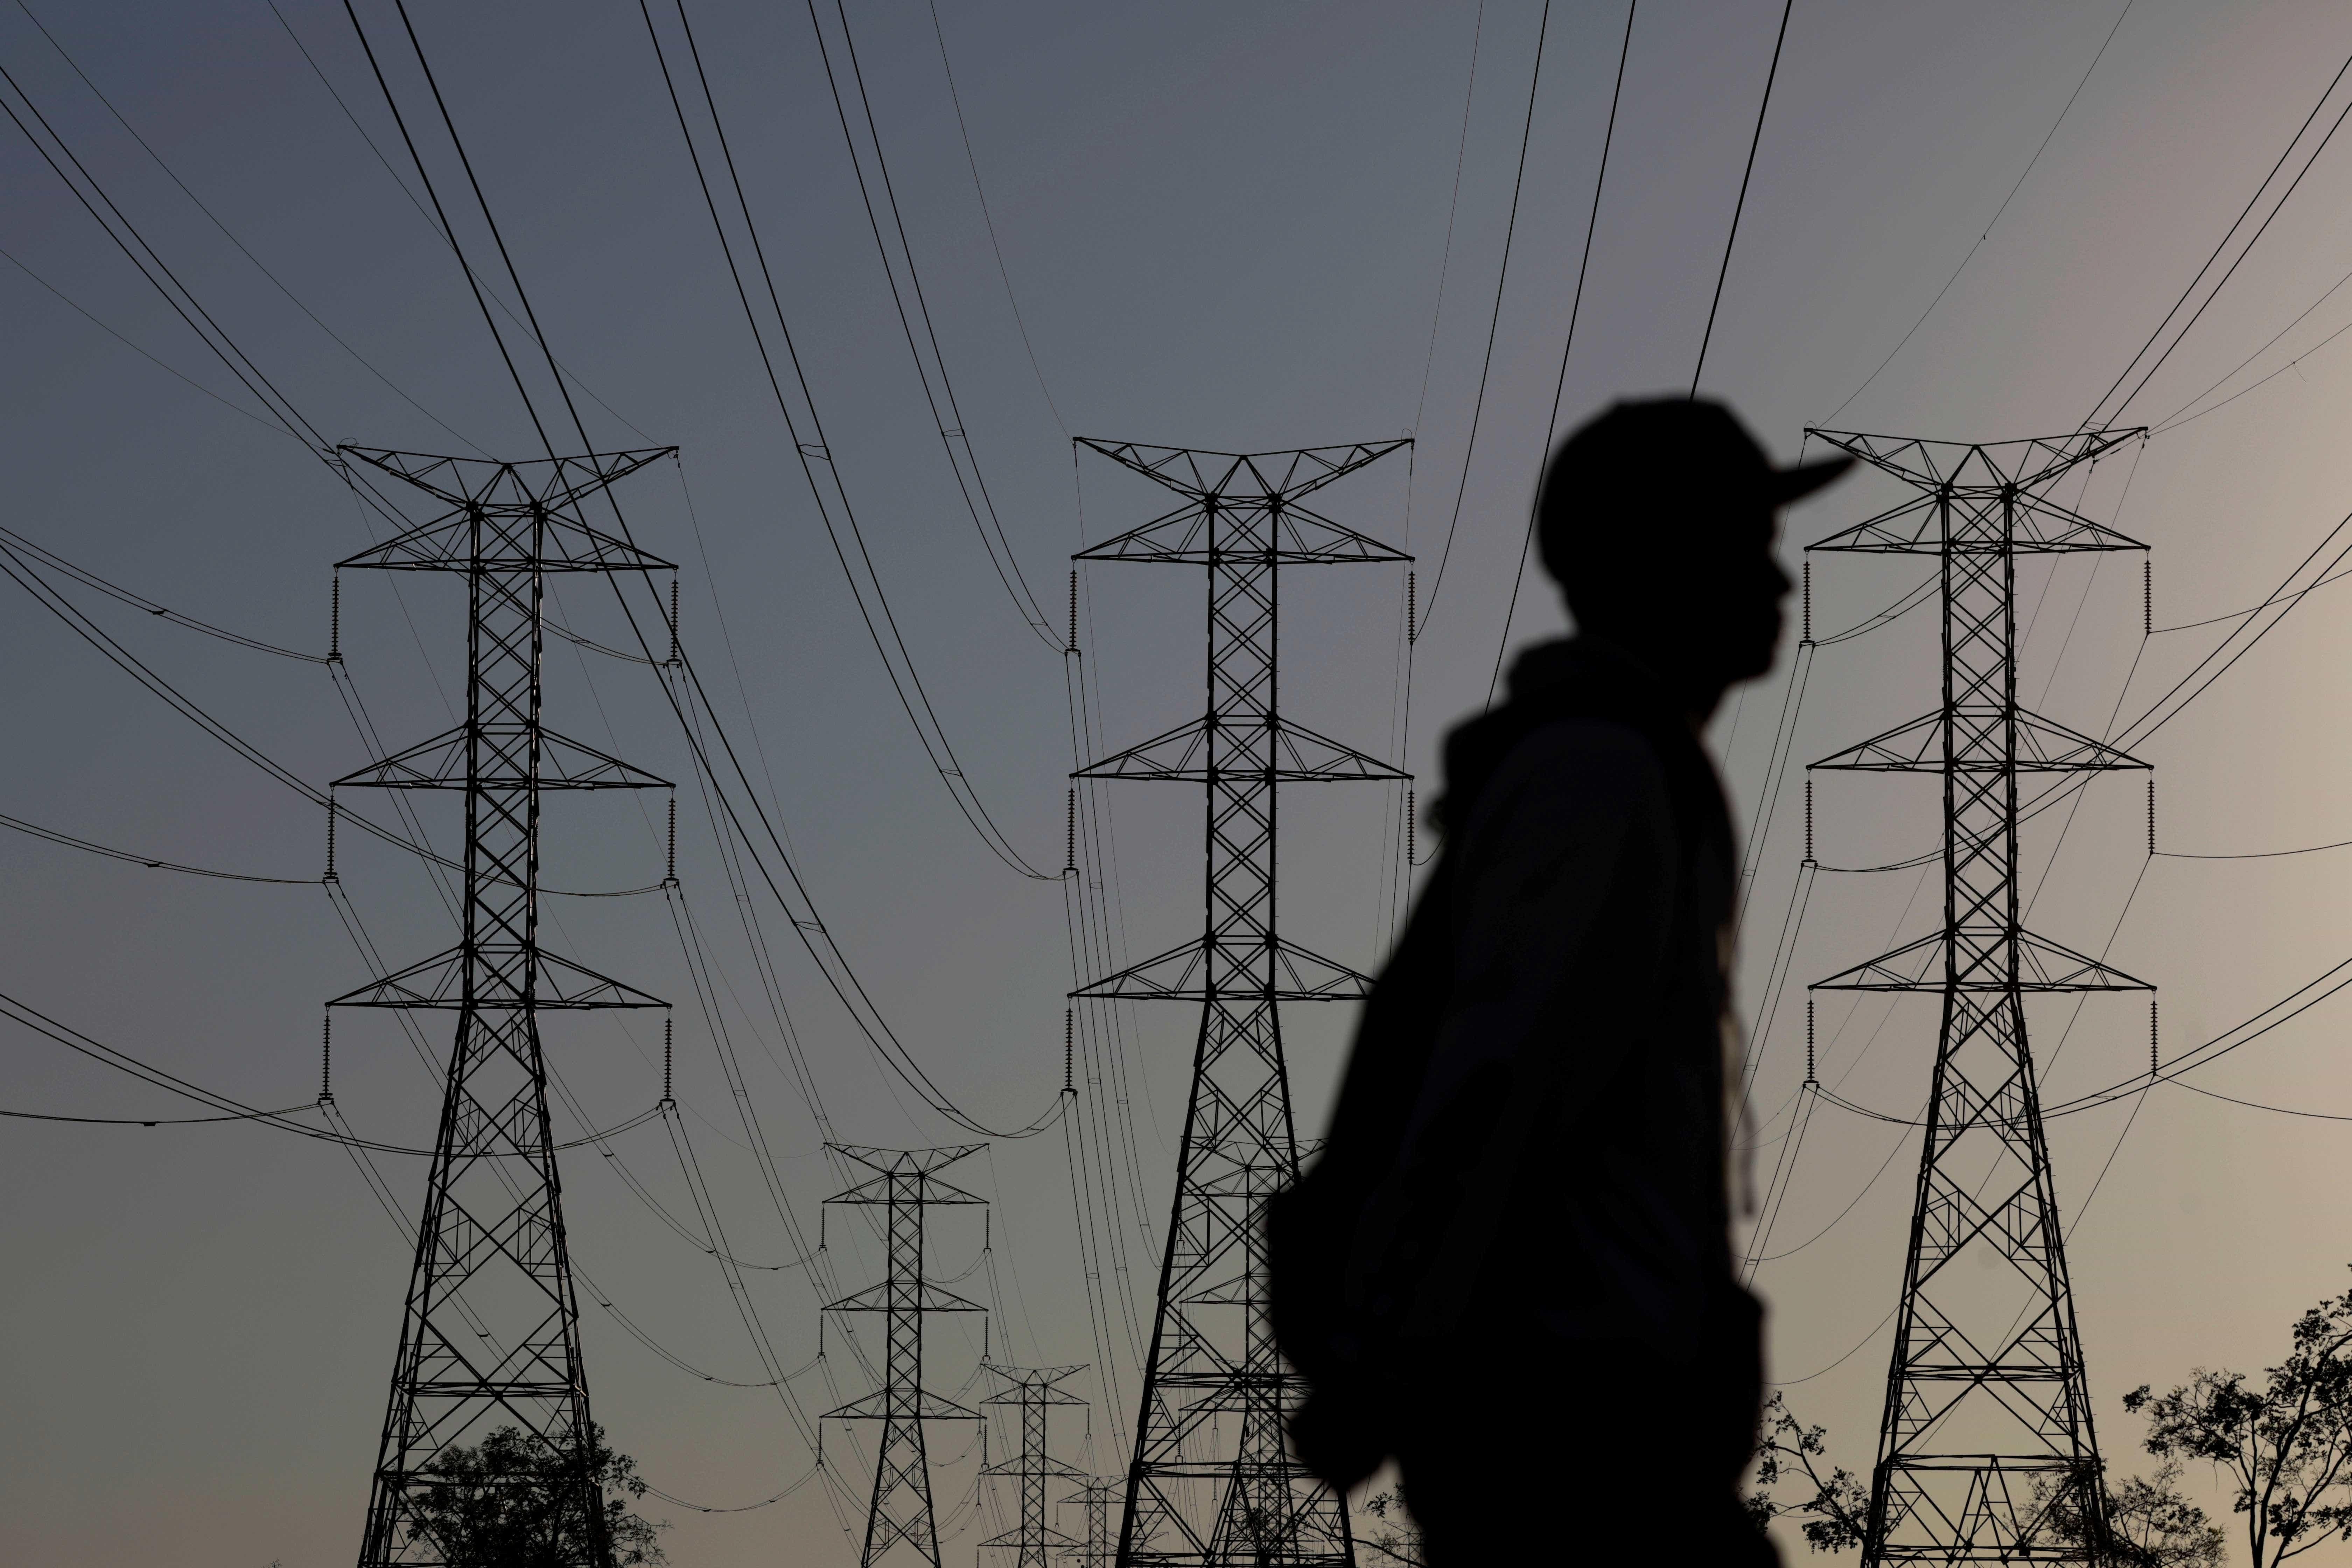 Justiça suspende reajustes tarifários de três distribuidoras de energia